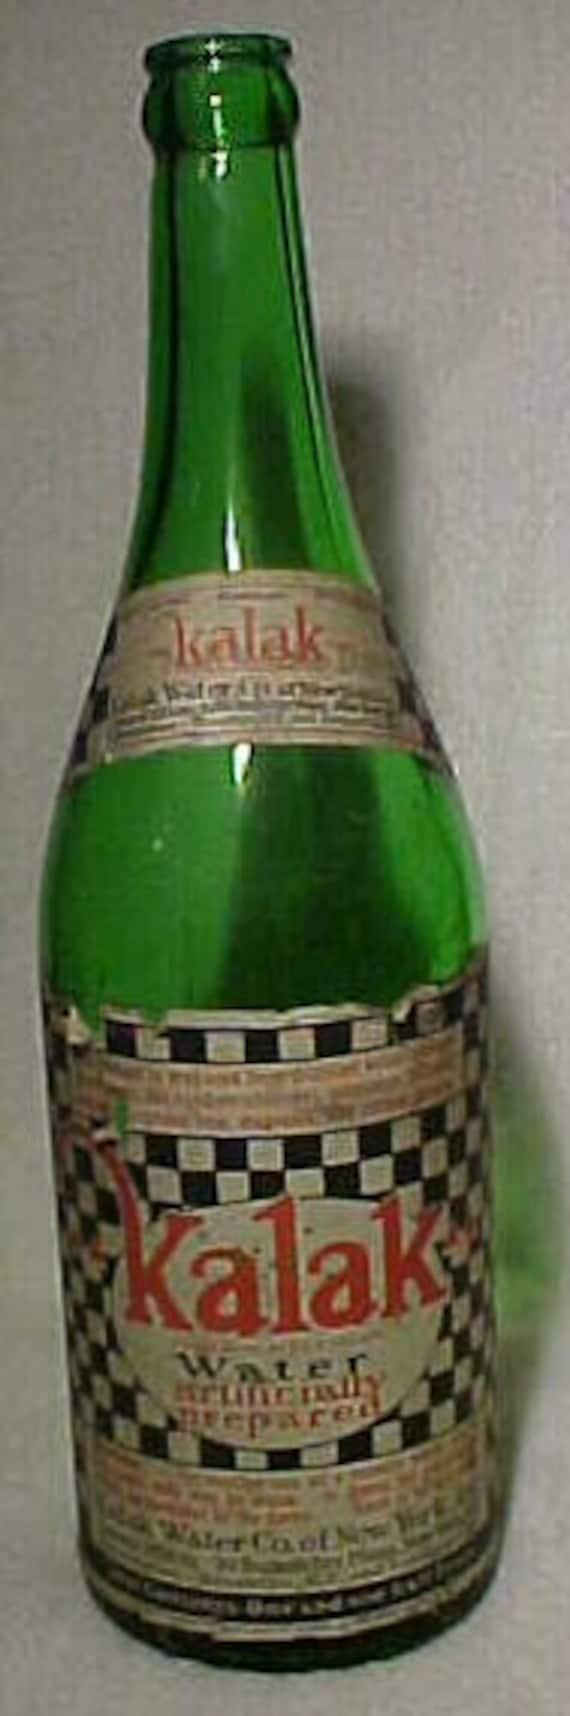 c1930 Kalak Water Kalak Water Co. of New York, Original Paper Labeled Soda Bottle